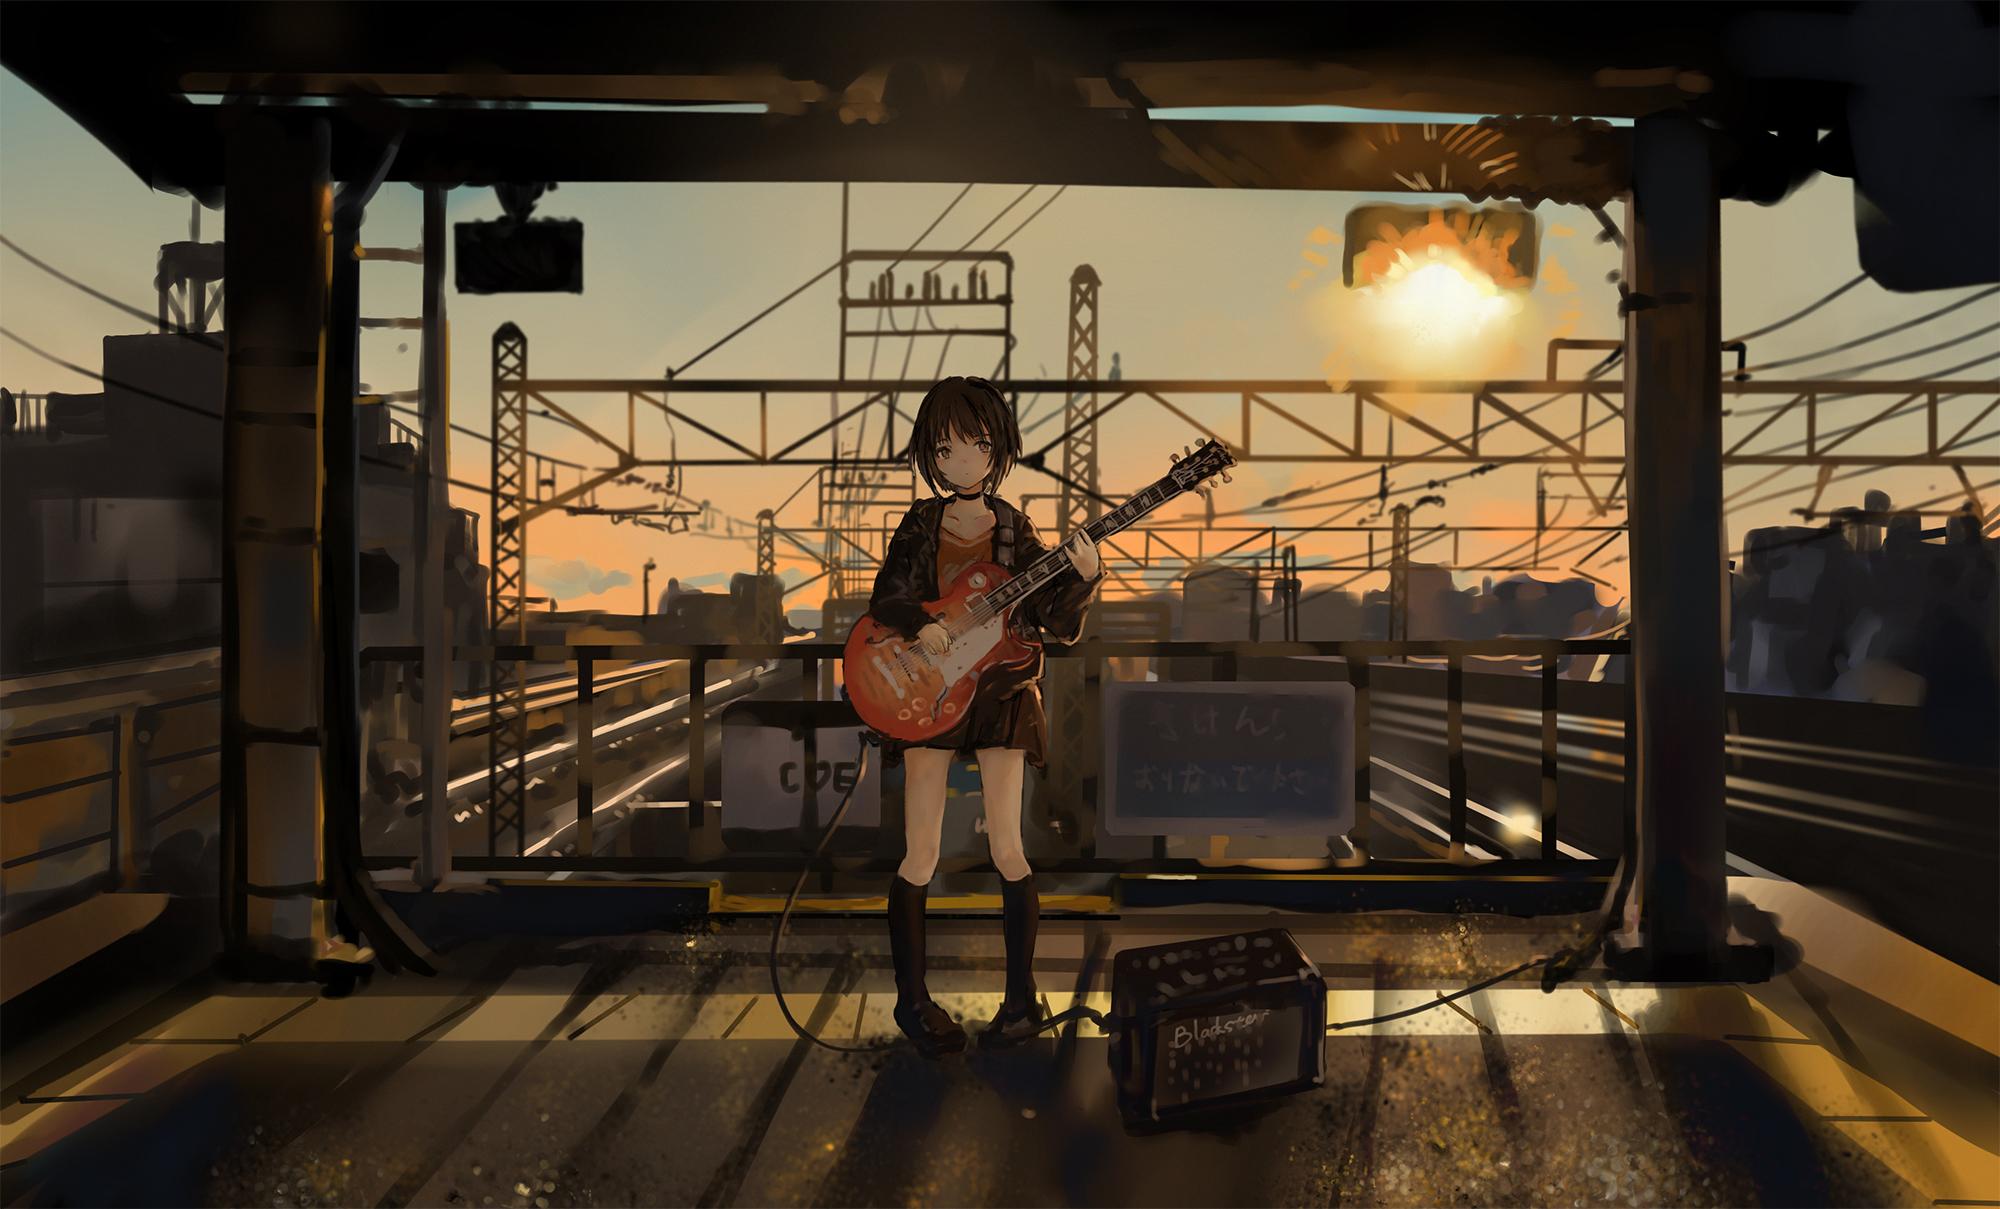 Anime 2000x1209 anime anime girls catzz guitar music railway